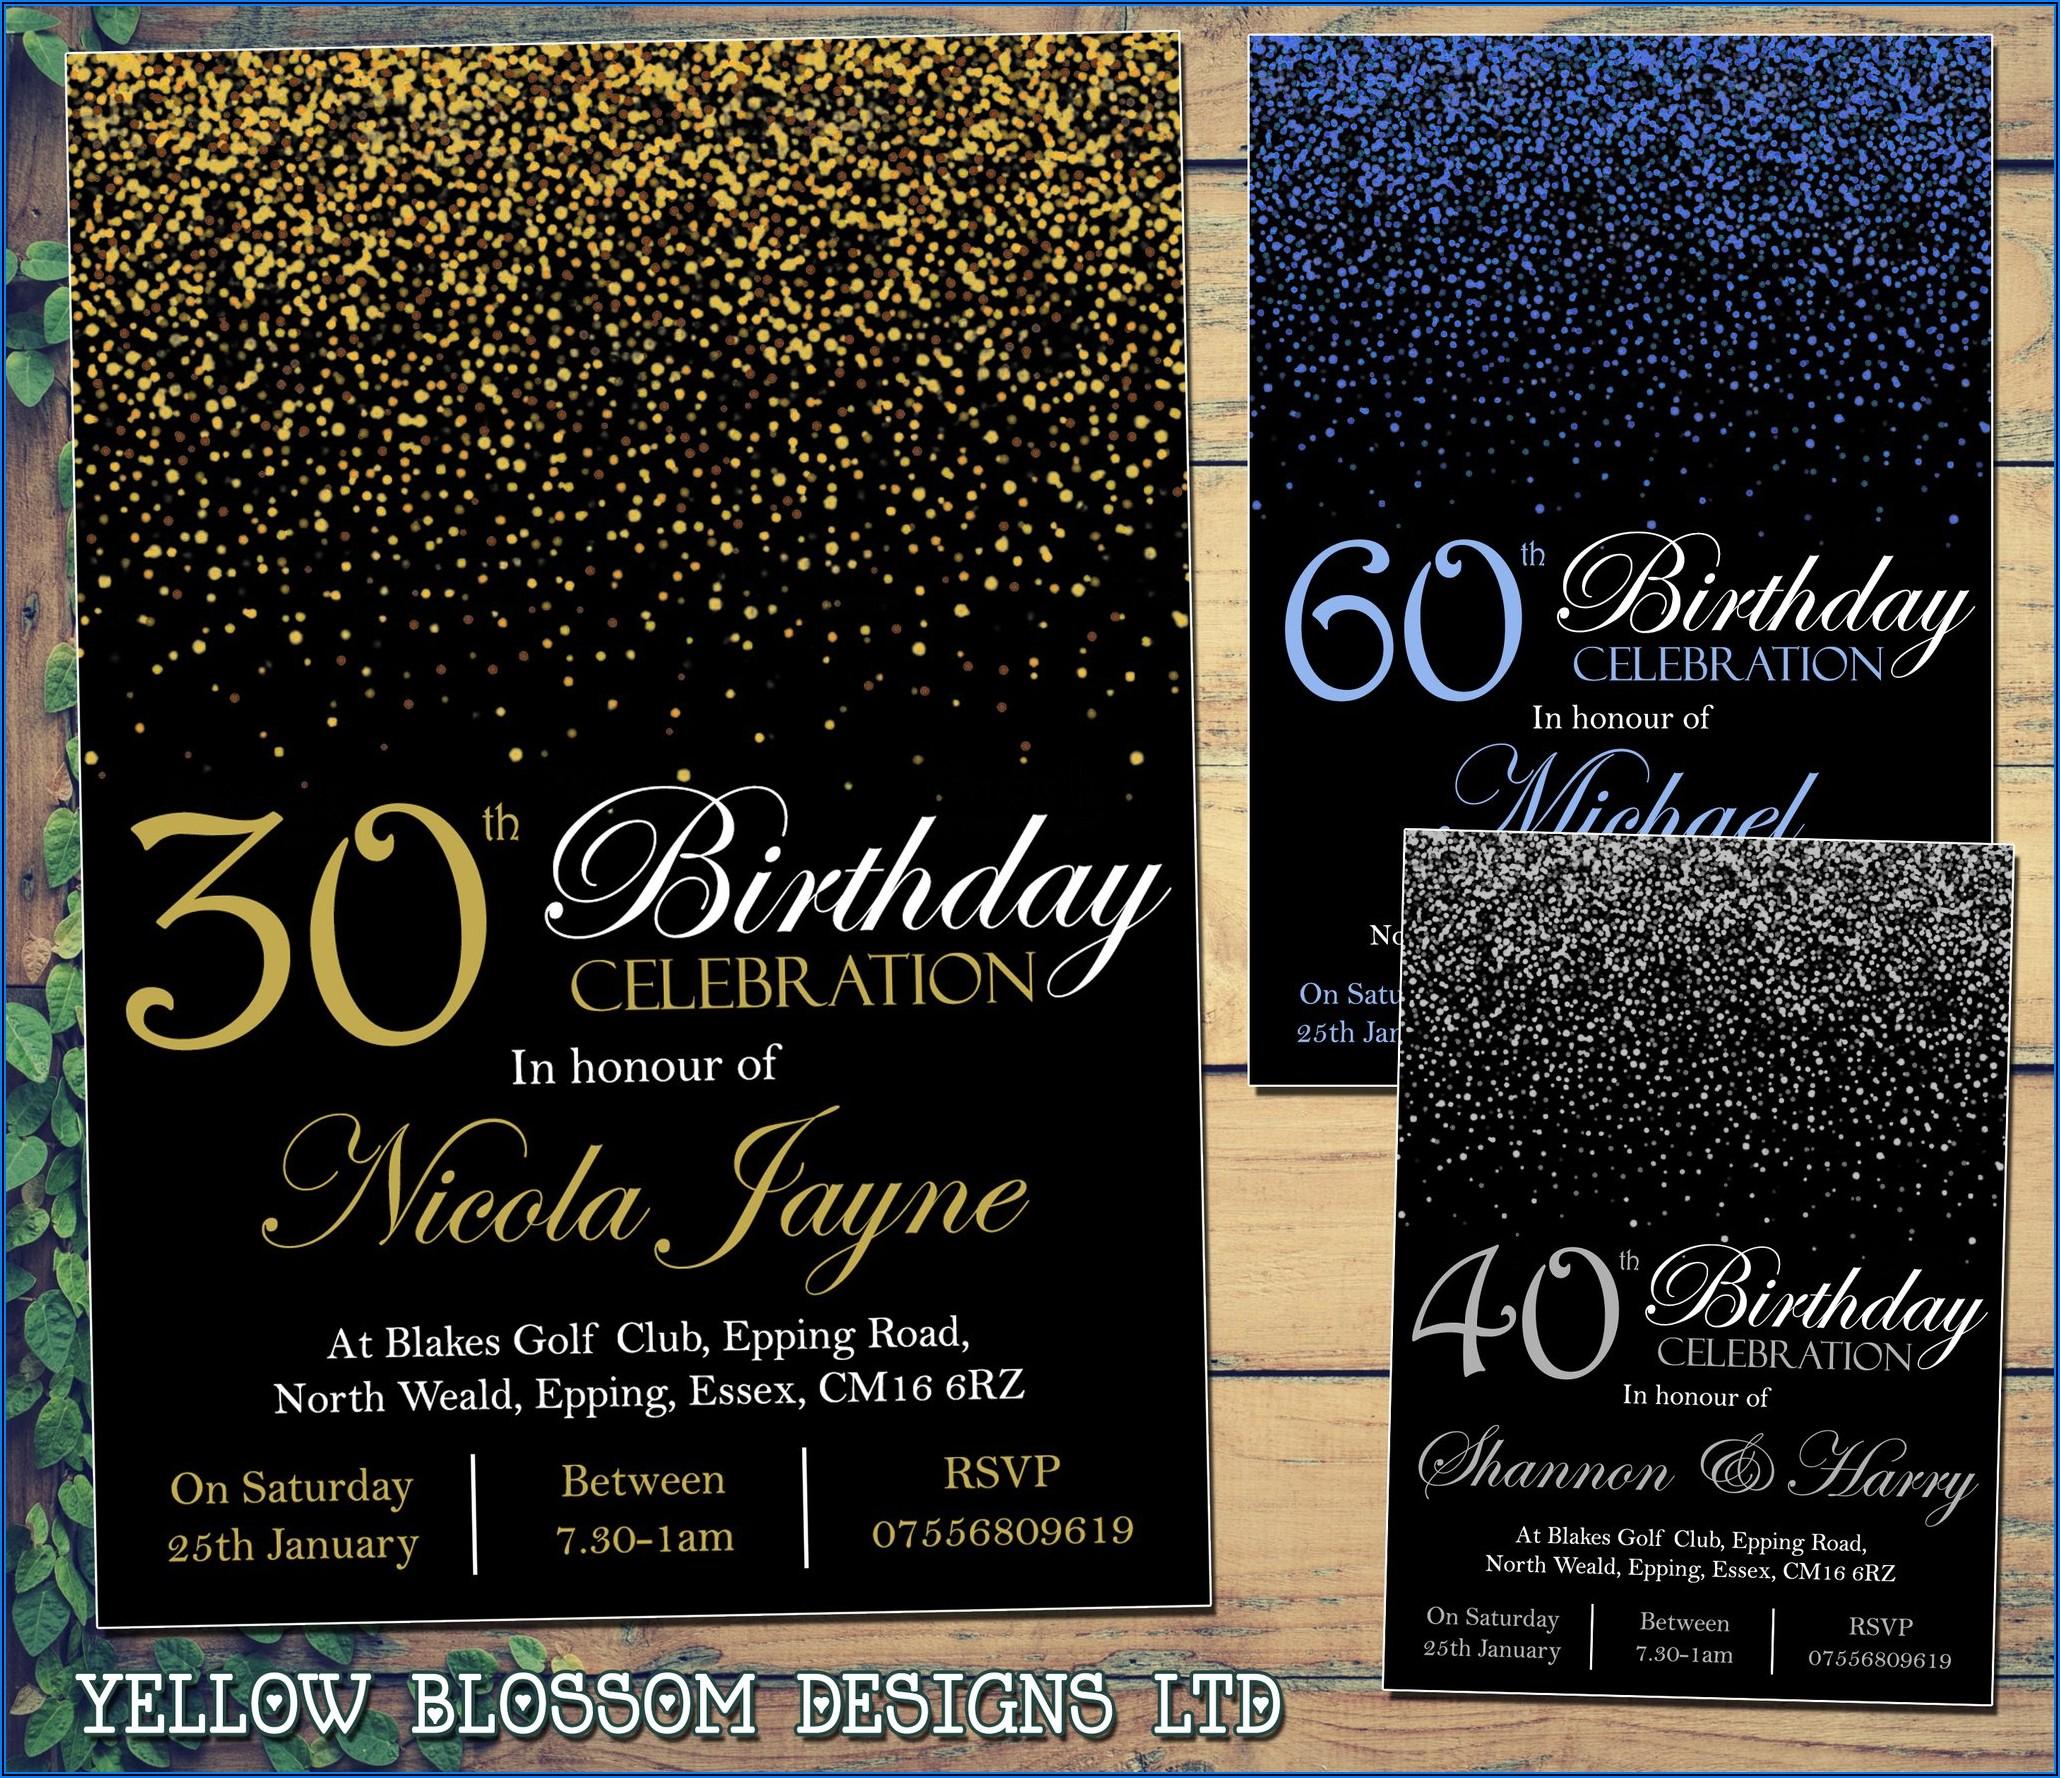 30th Birthday Invitations Male